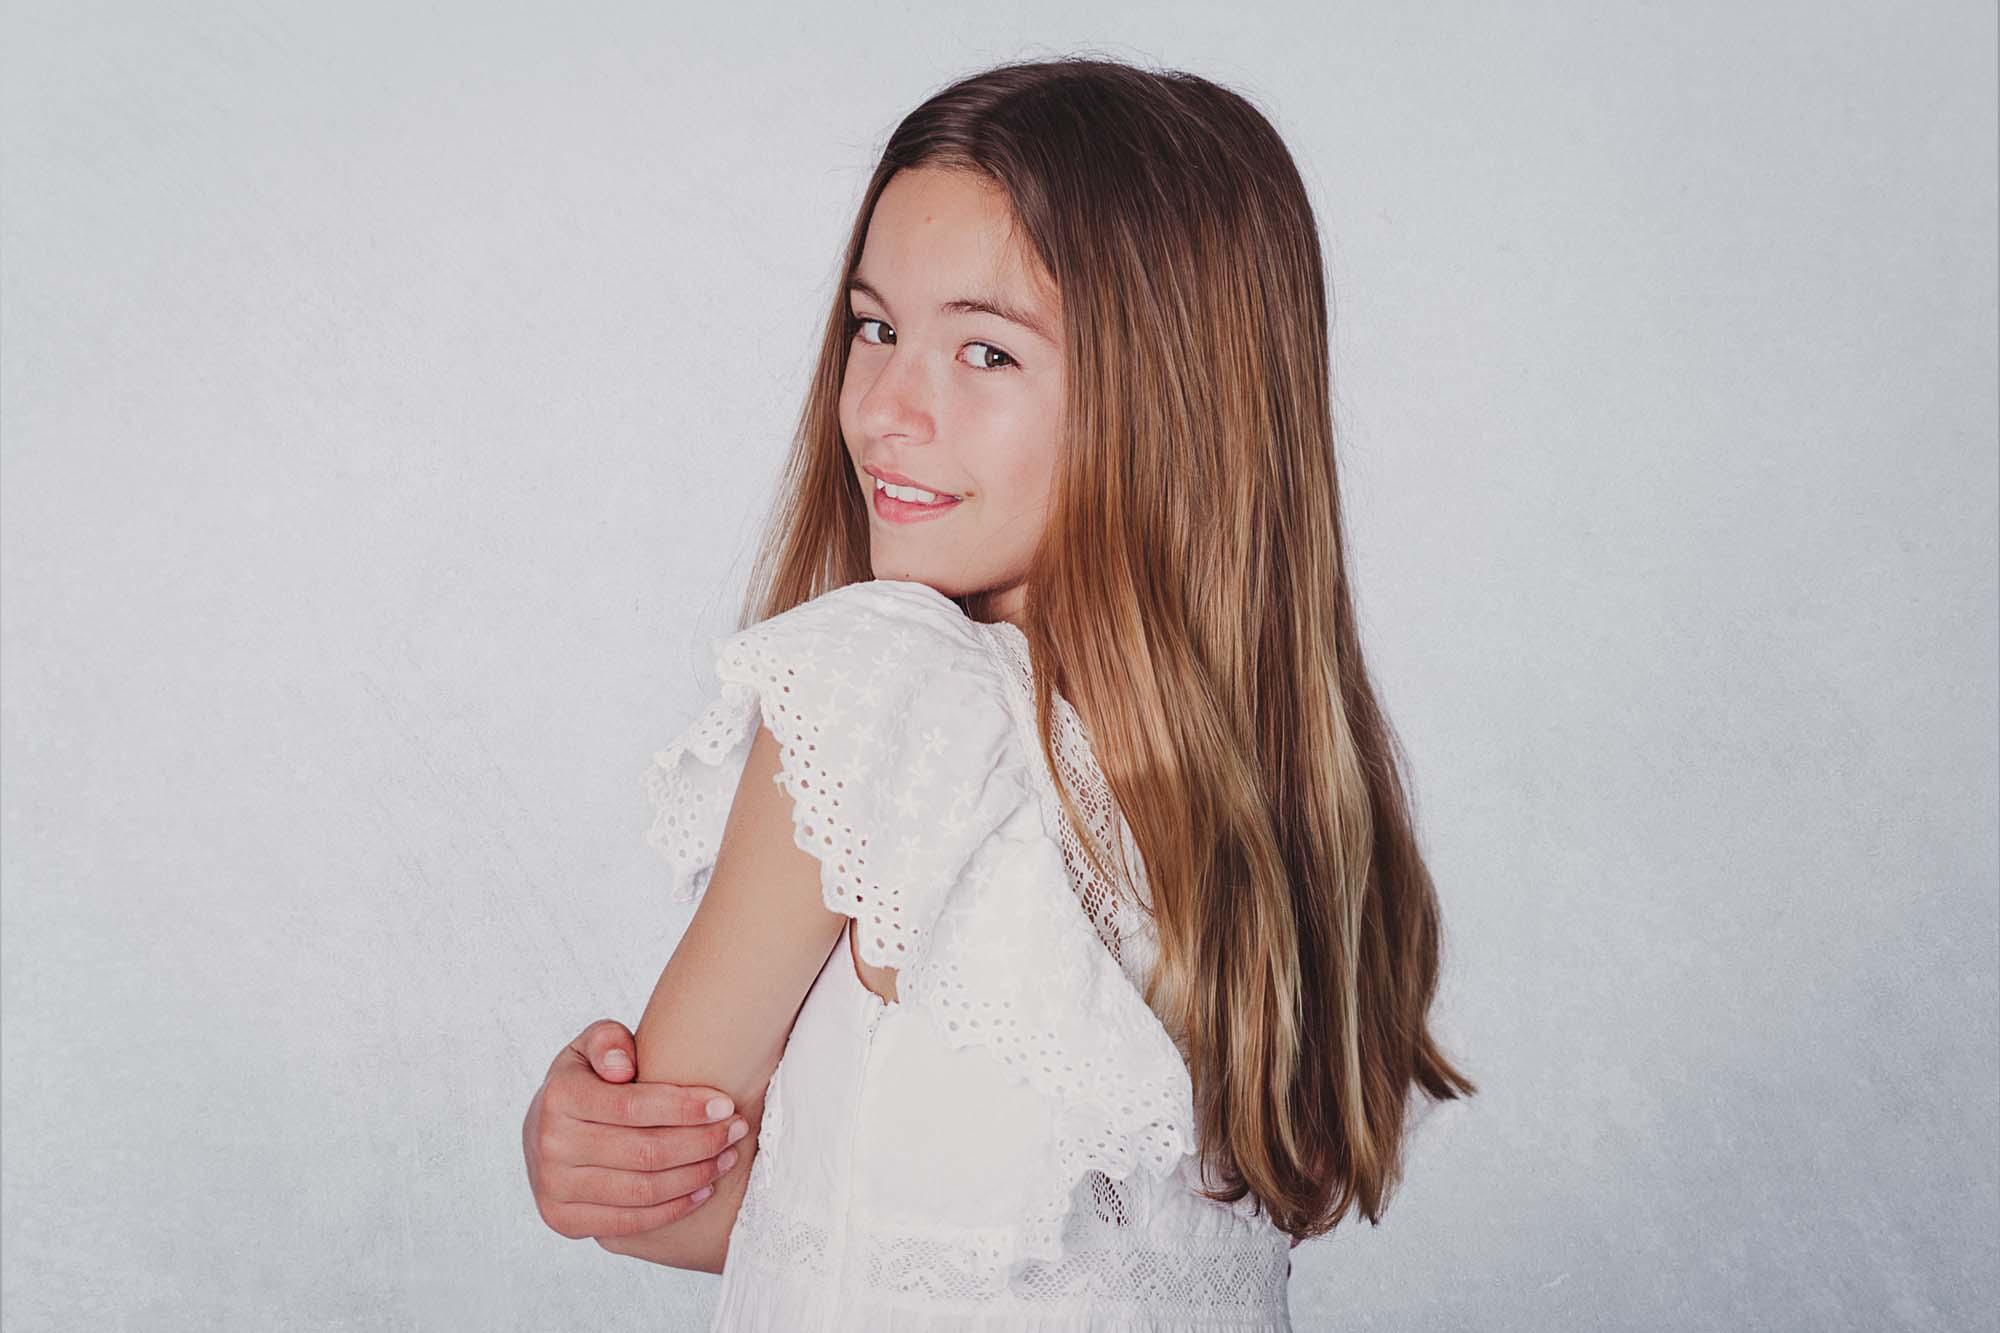 CameraObscura-Astrid (6 de 41).jpg